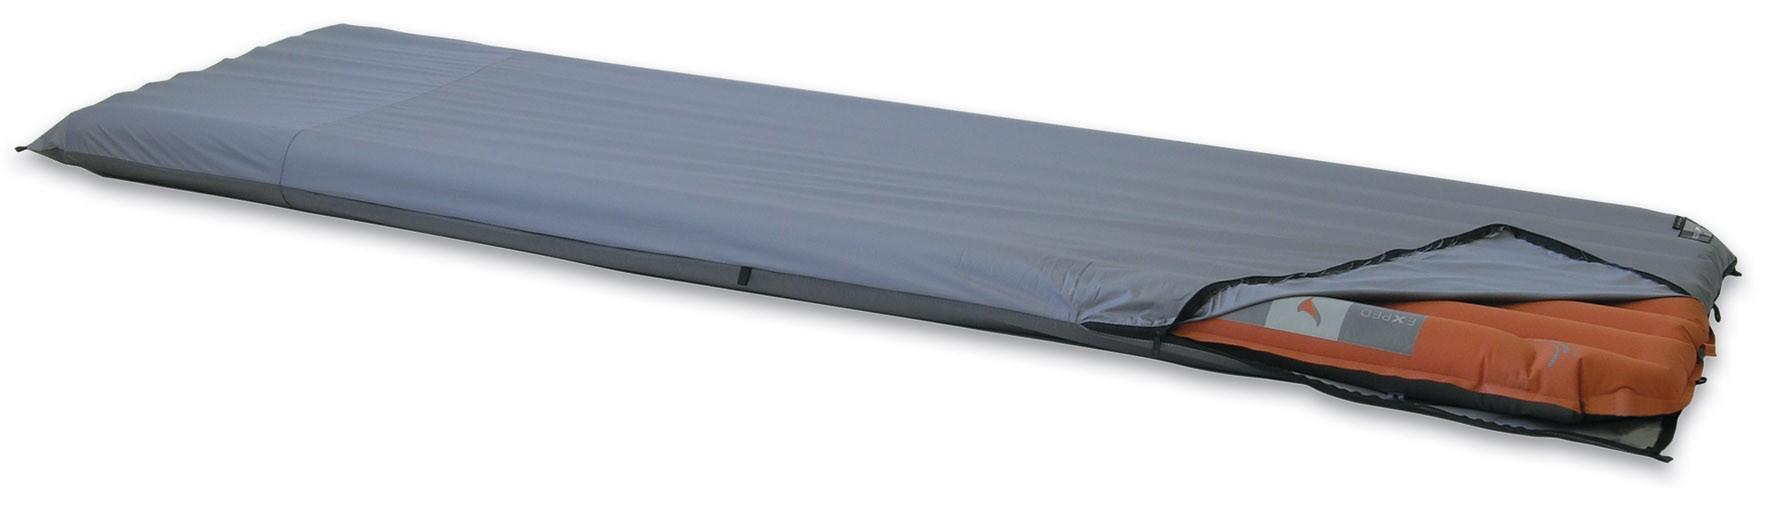 housse pour matelas exped mat cover. Black Bedroom Furniture Sets. Home Design Ideas